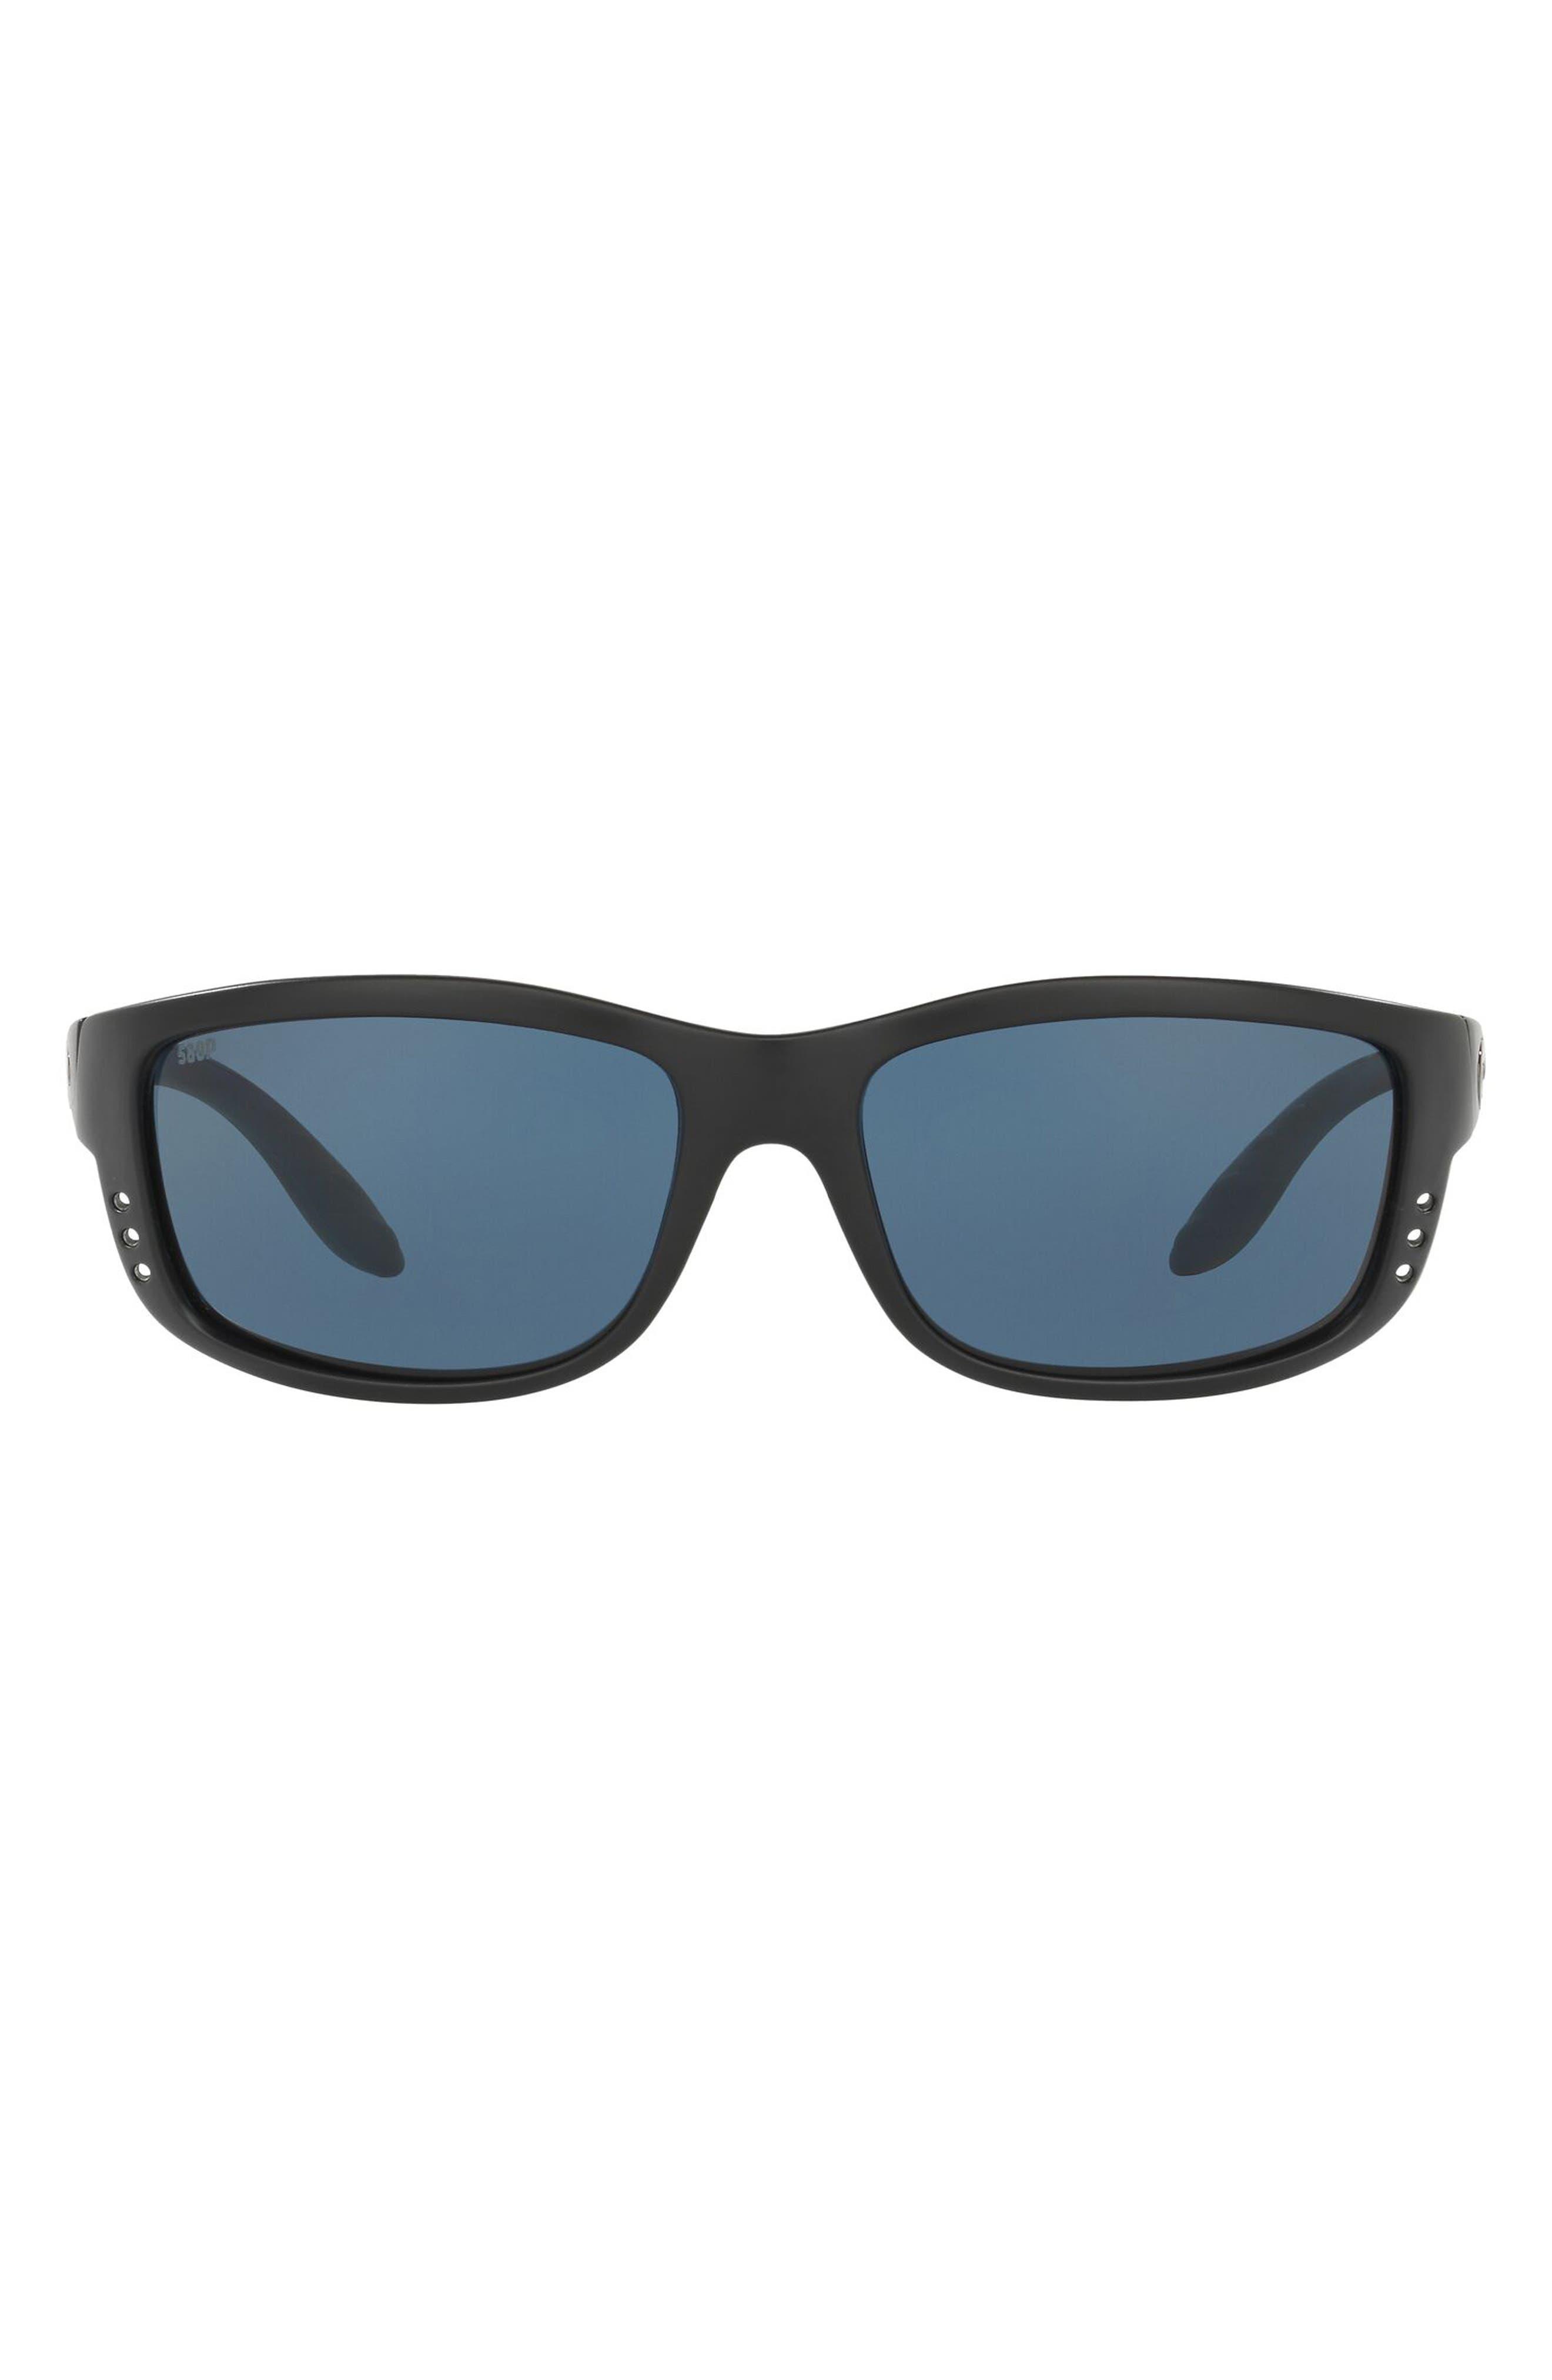 61mm Poloarized Rectangular Sunglasses